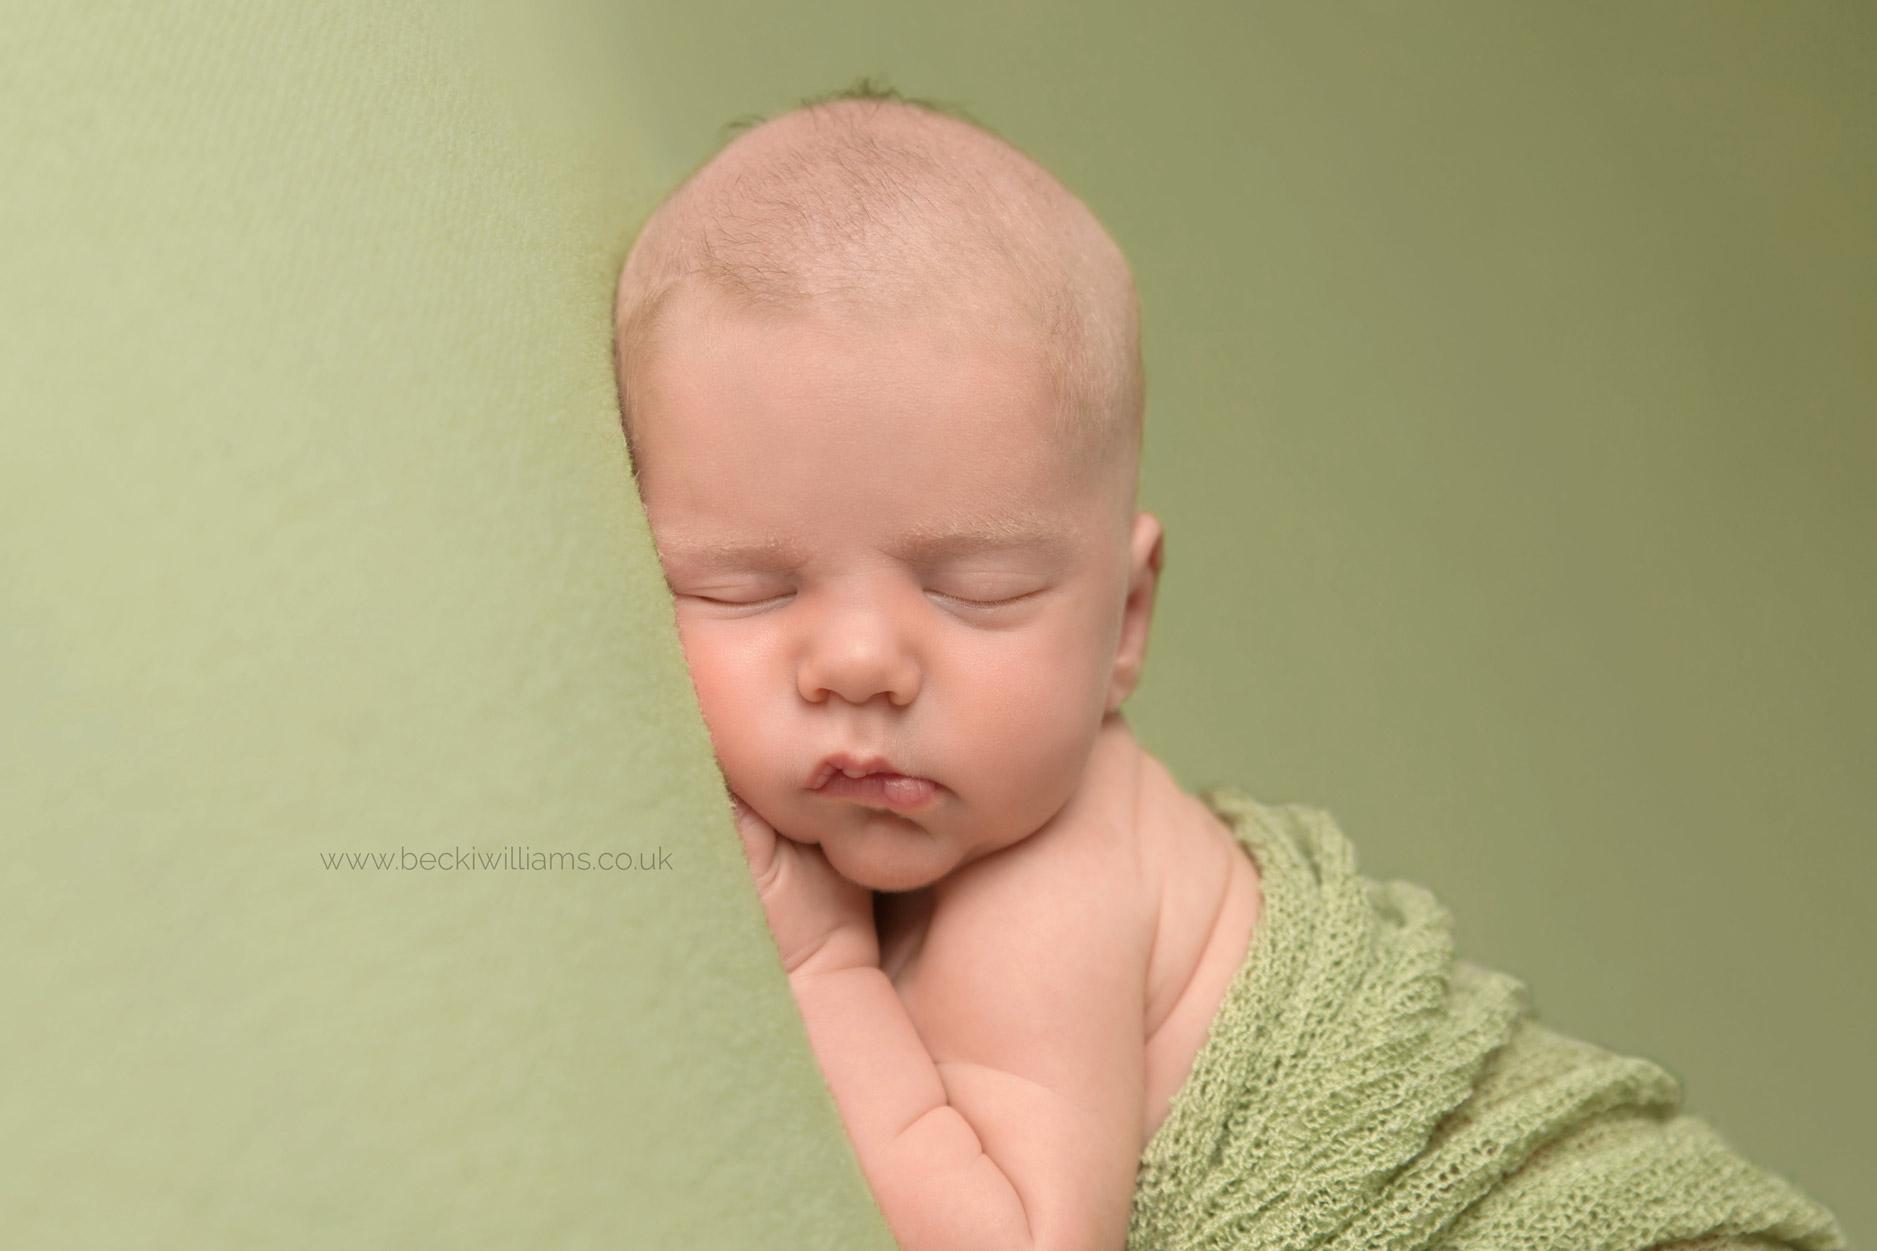 newborn-photography-hemel-hempstead-green-close-up.jpg